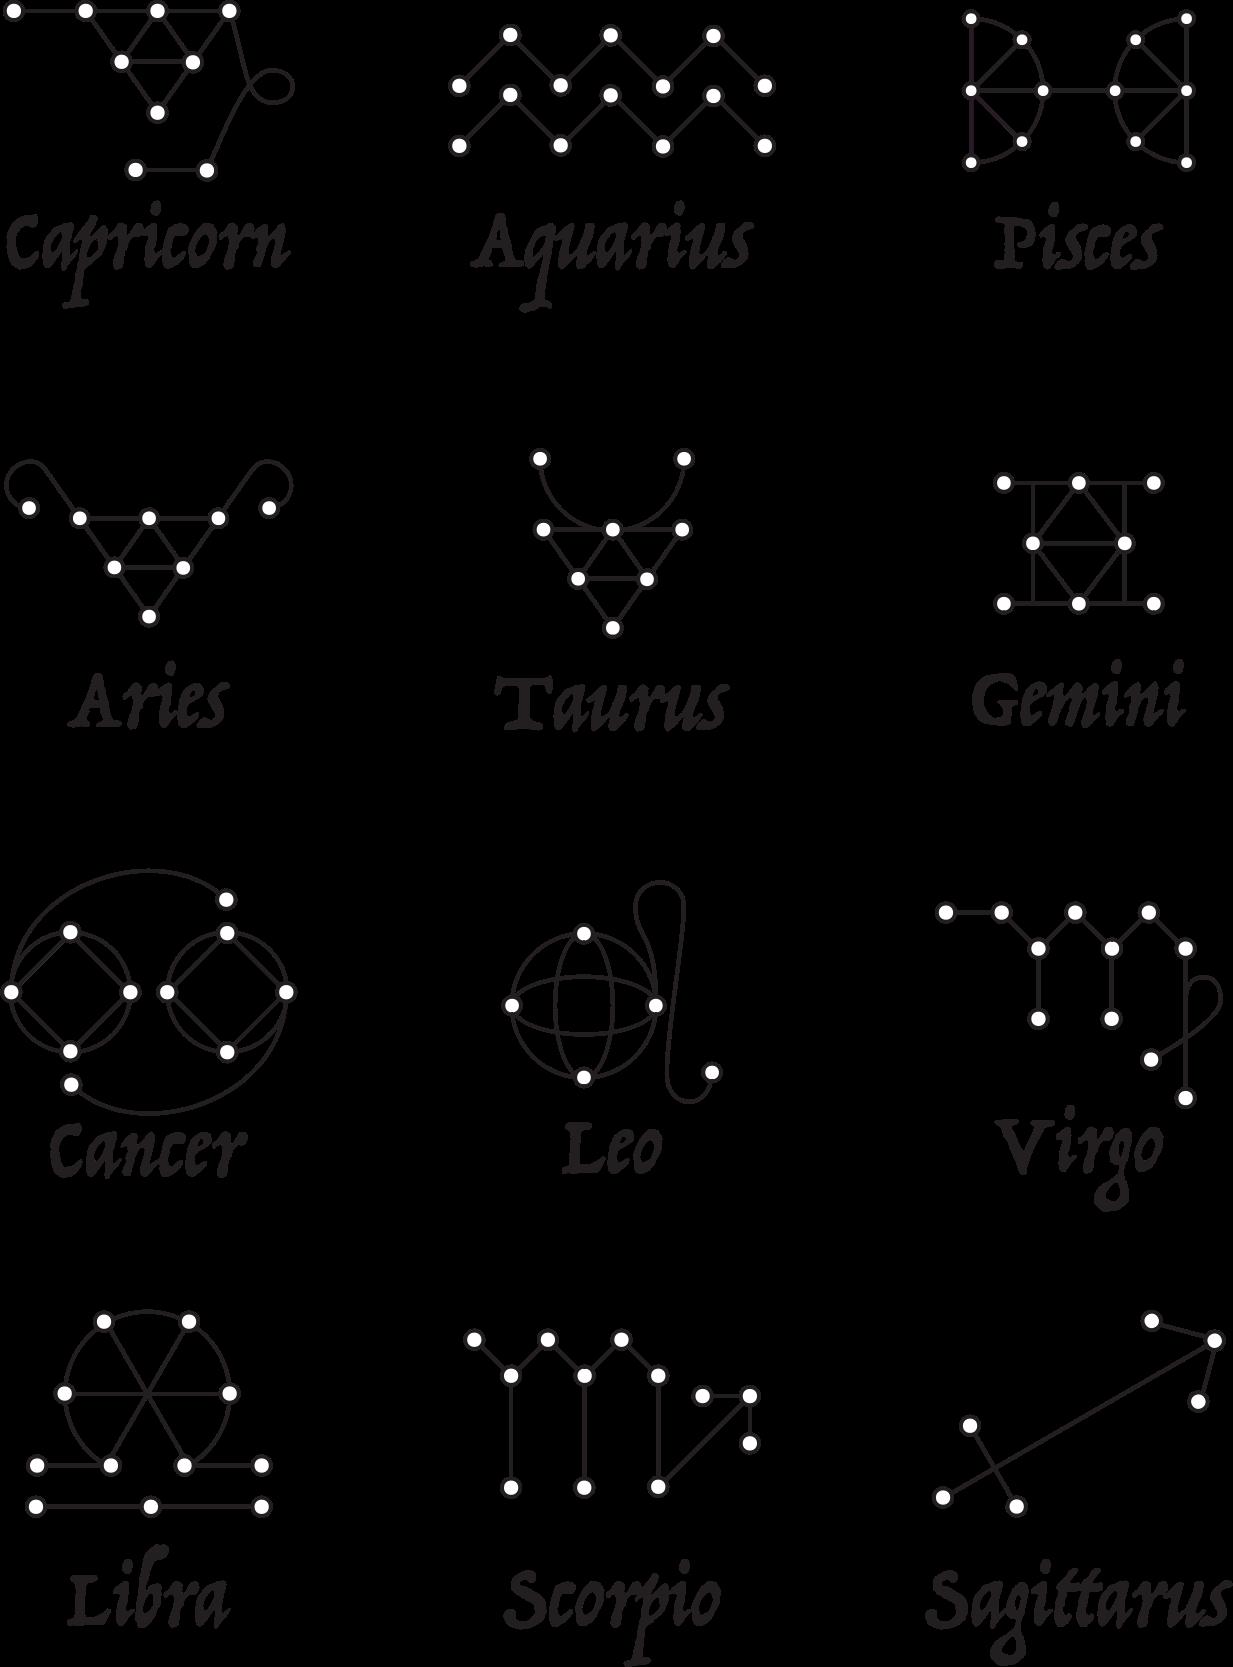 Line Art Zodiac Signs By Bnsonger47 Zodiac Signs Symbols Zodiac Signs Gemini Horoscope Tattoos